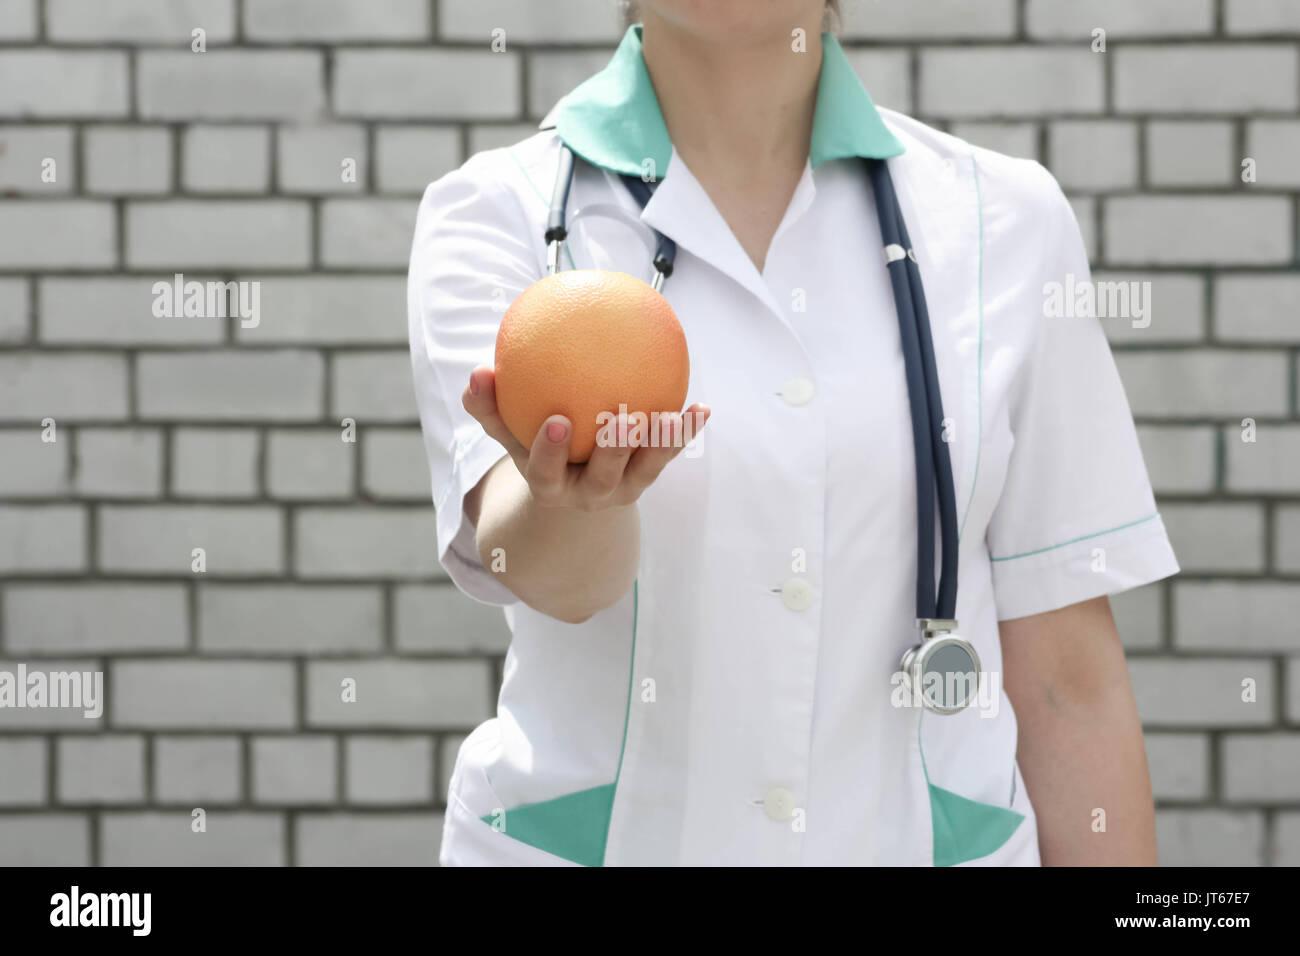 Medicine Concept Doctor Diet And Proper Nutrition Vitamin Orange